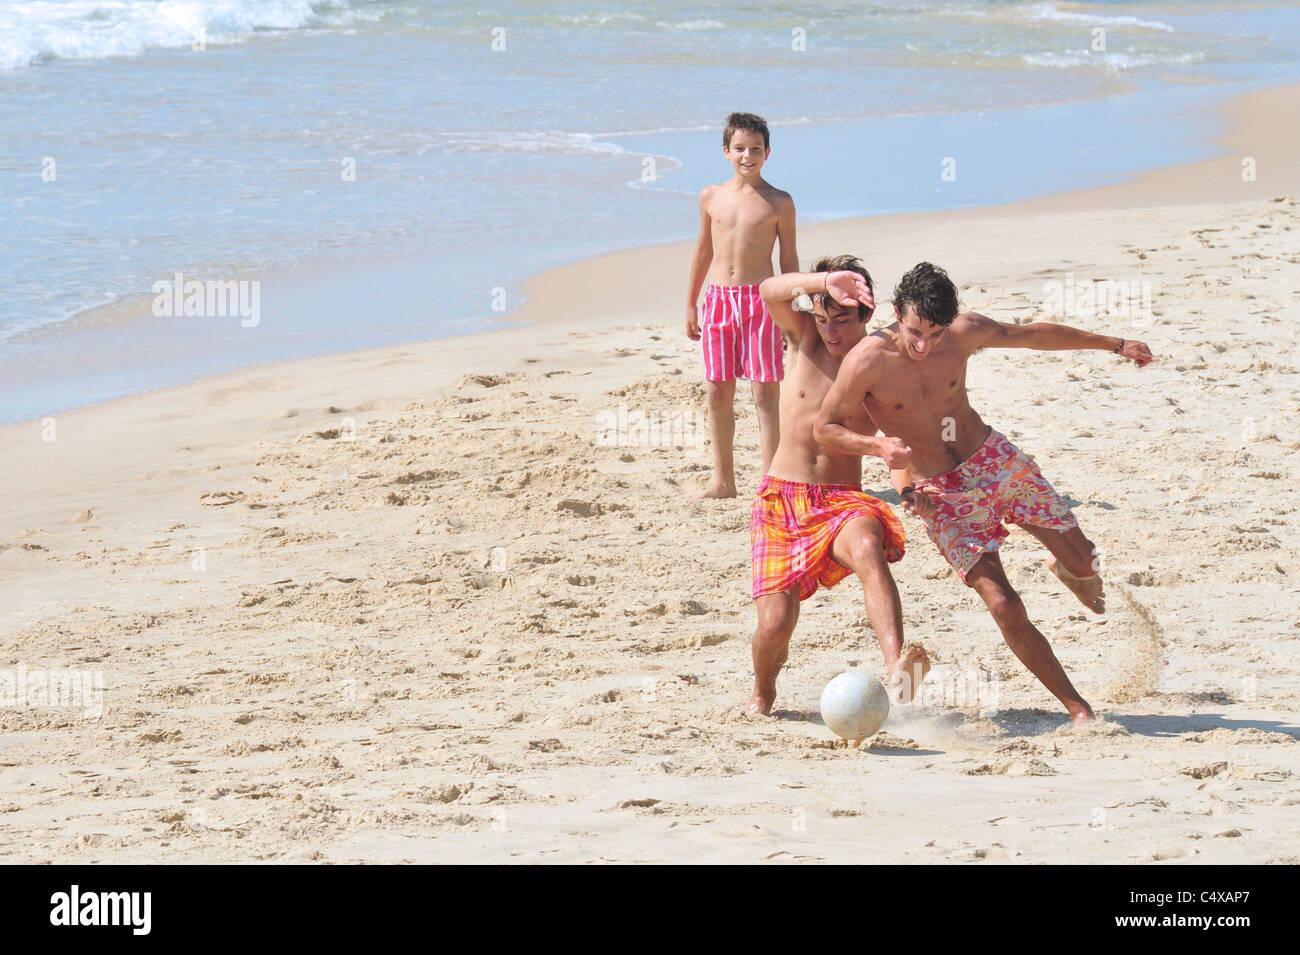 Israeli boys play football in the hot weather in Nitzanim beach, Israel. Stock Photo